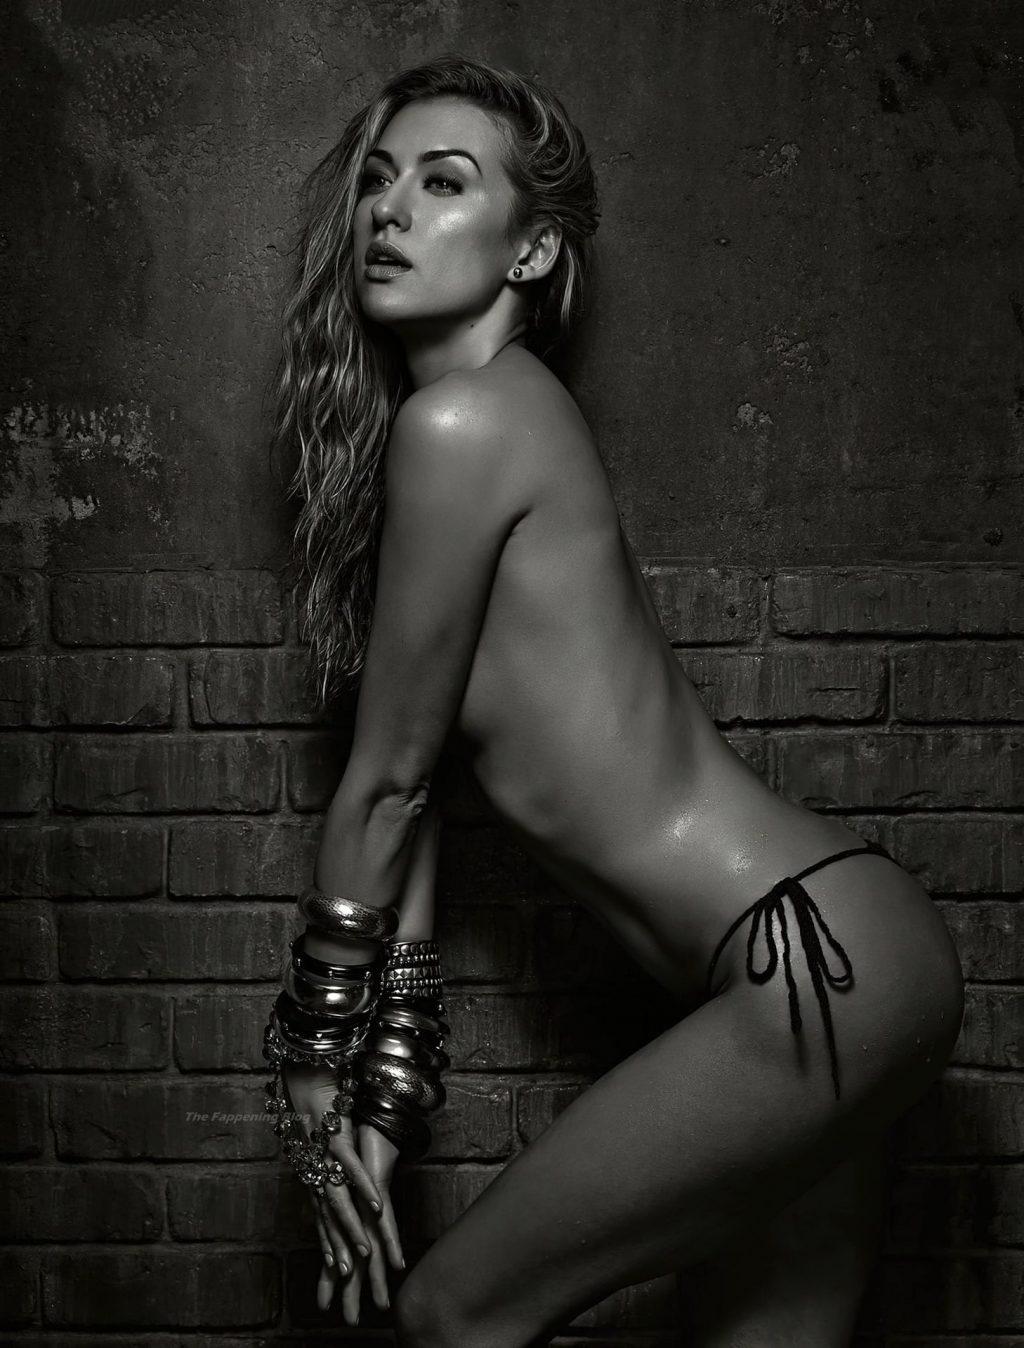 Tasya Teles Nude (8 Photos)